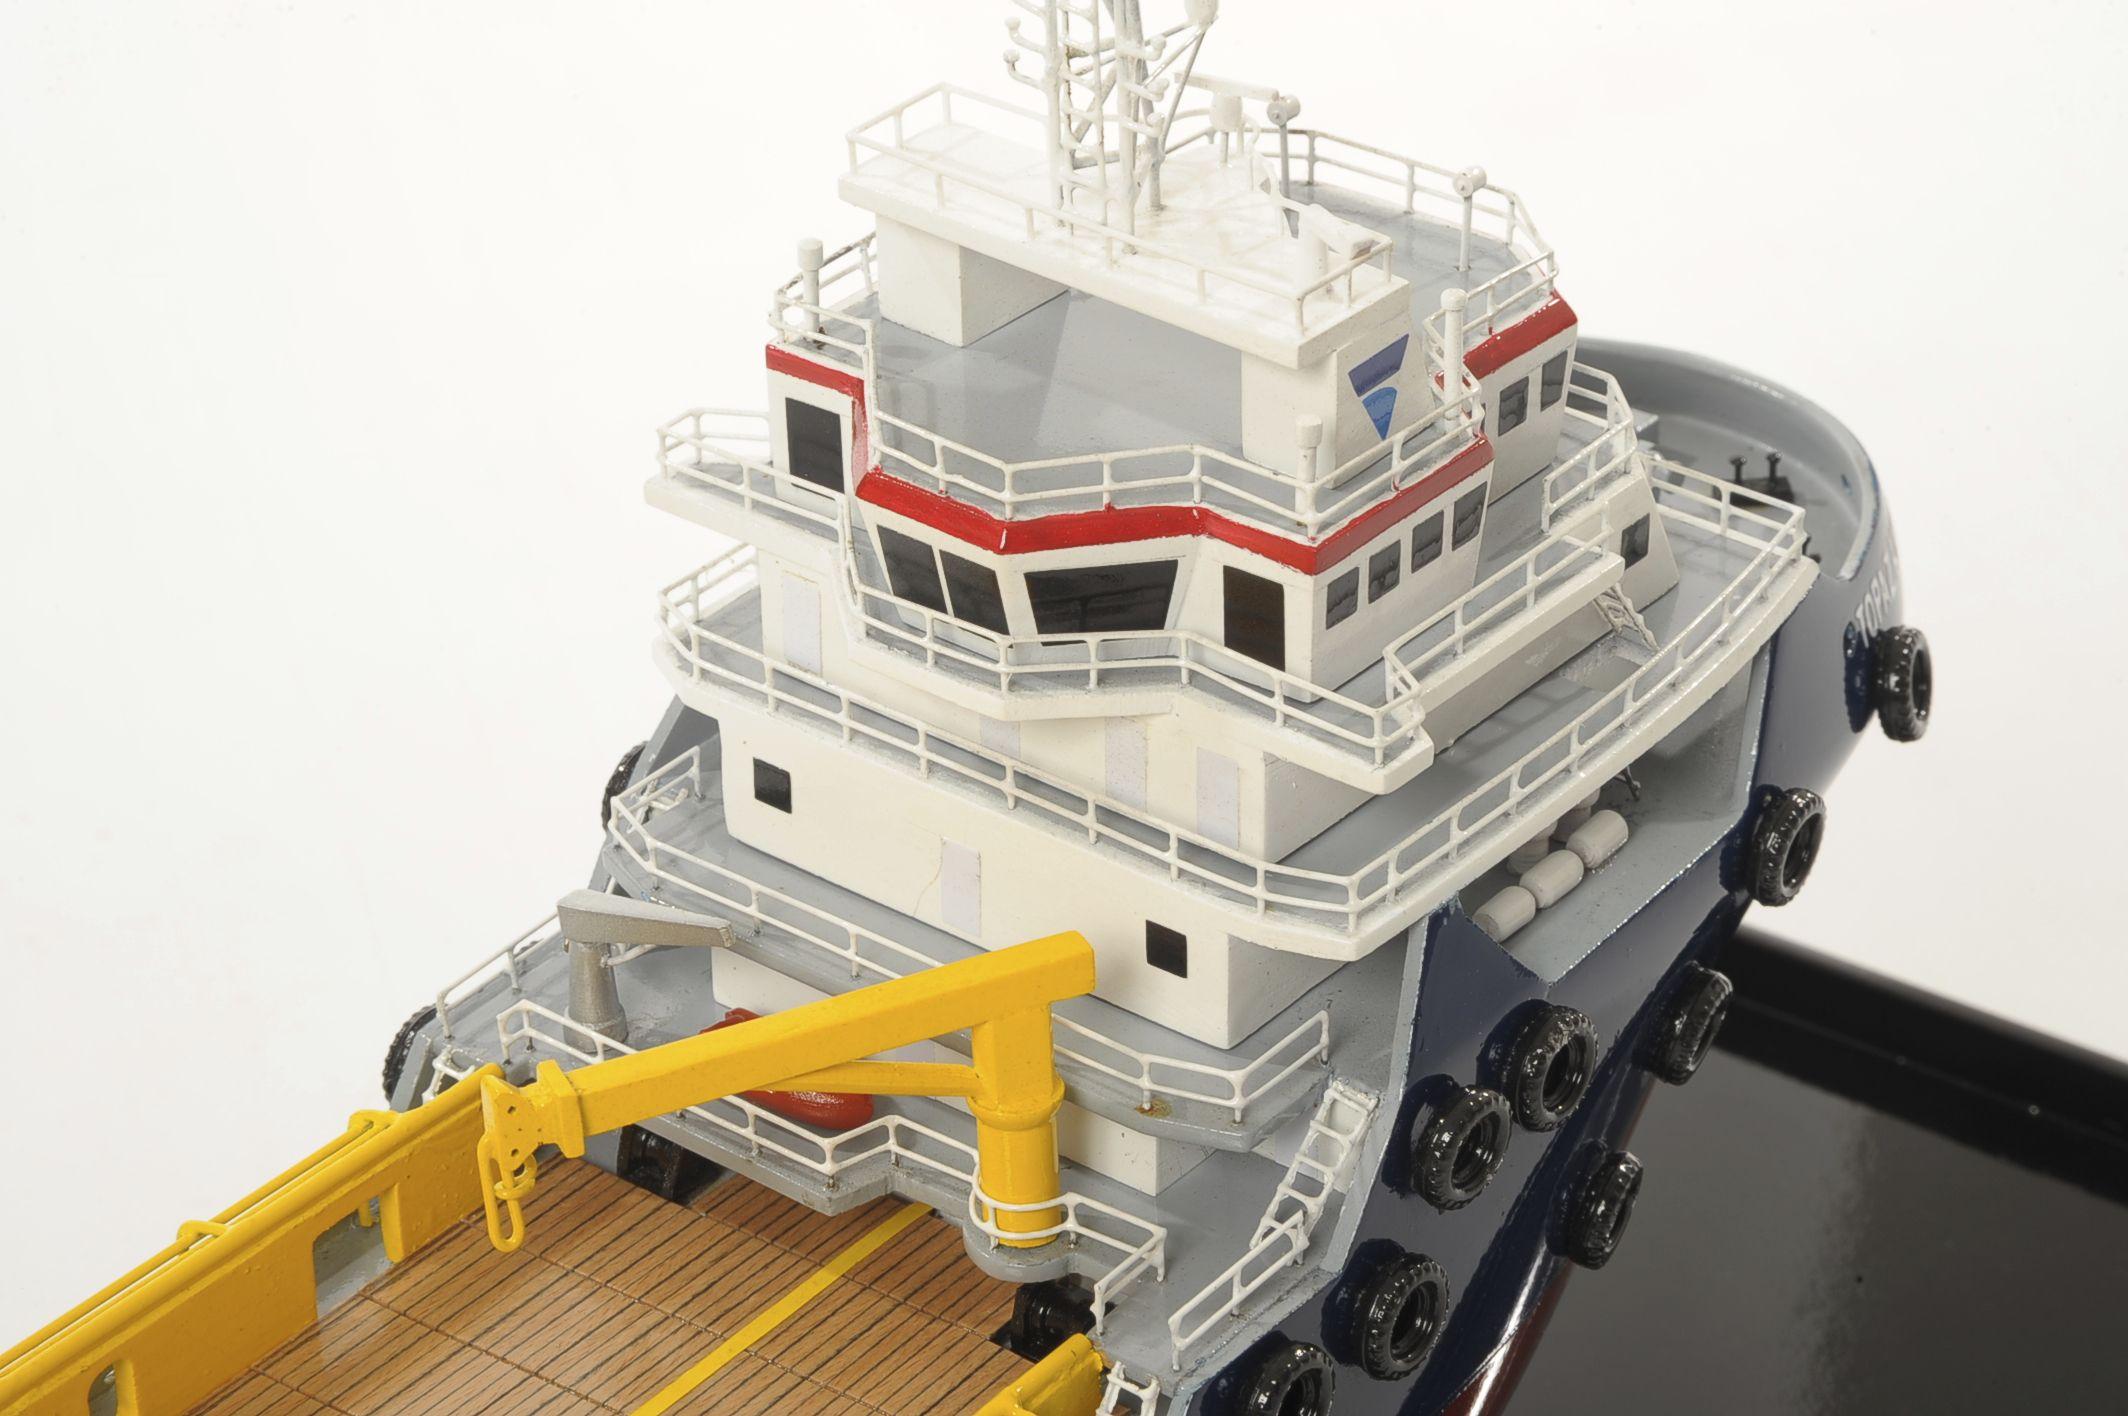 1515-8930-Topaz-Marine-Supply-Vessel-Model-ship